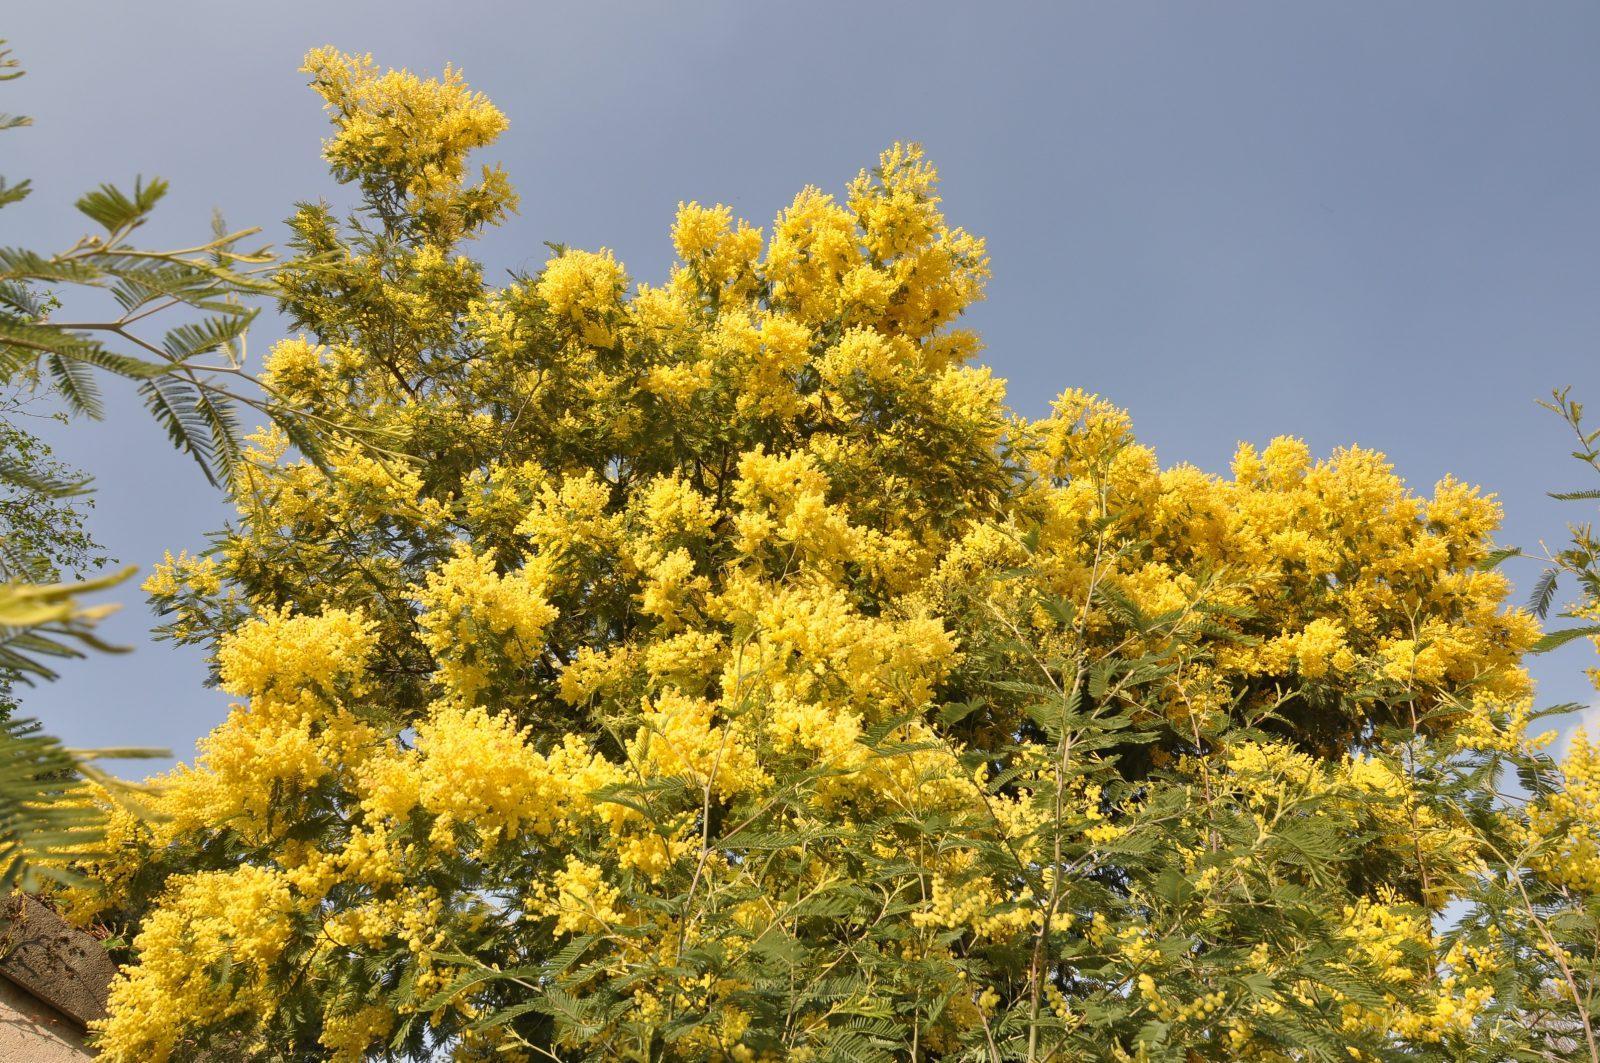 Acacia Dealbata Garden Shrub For Sale Uk Letsgoplantingcouk